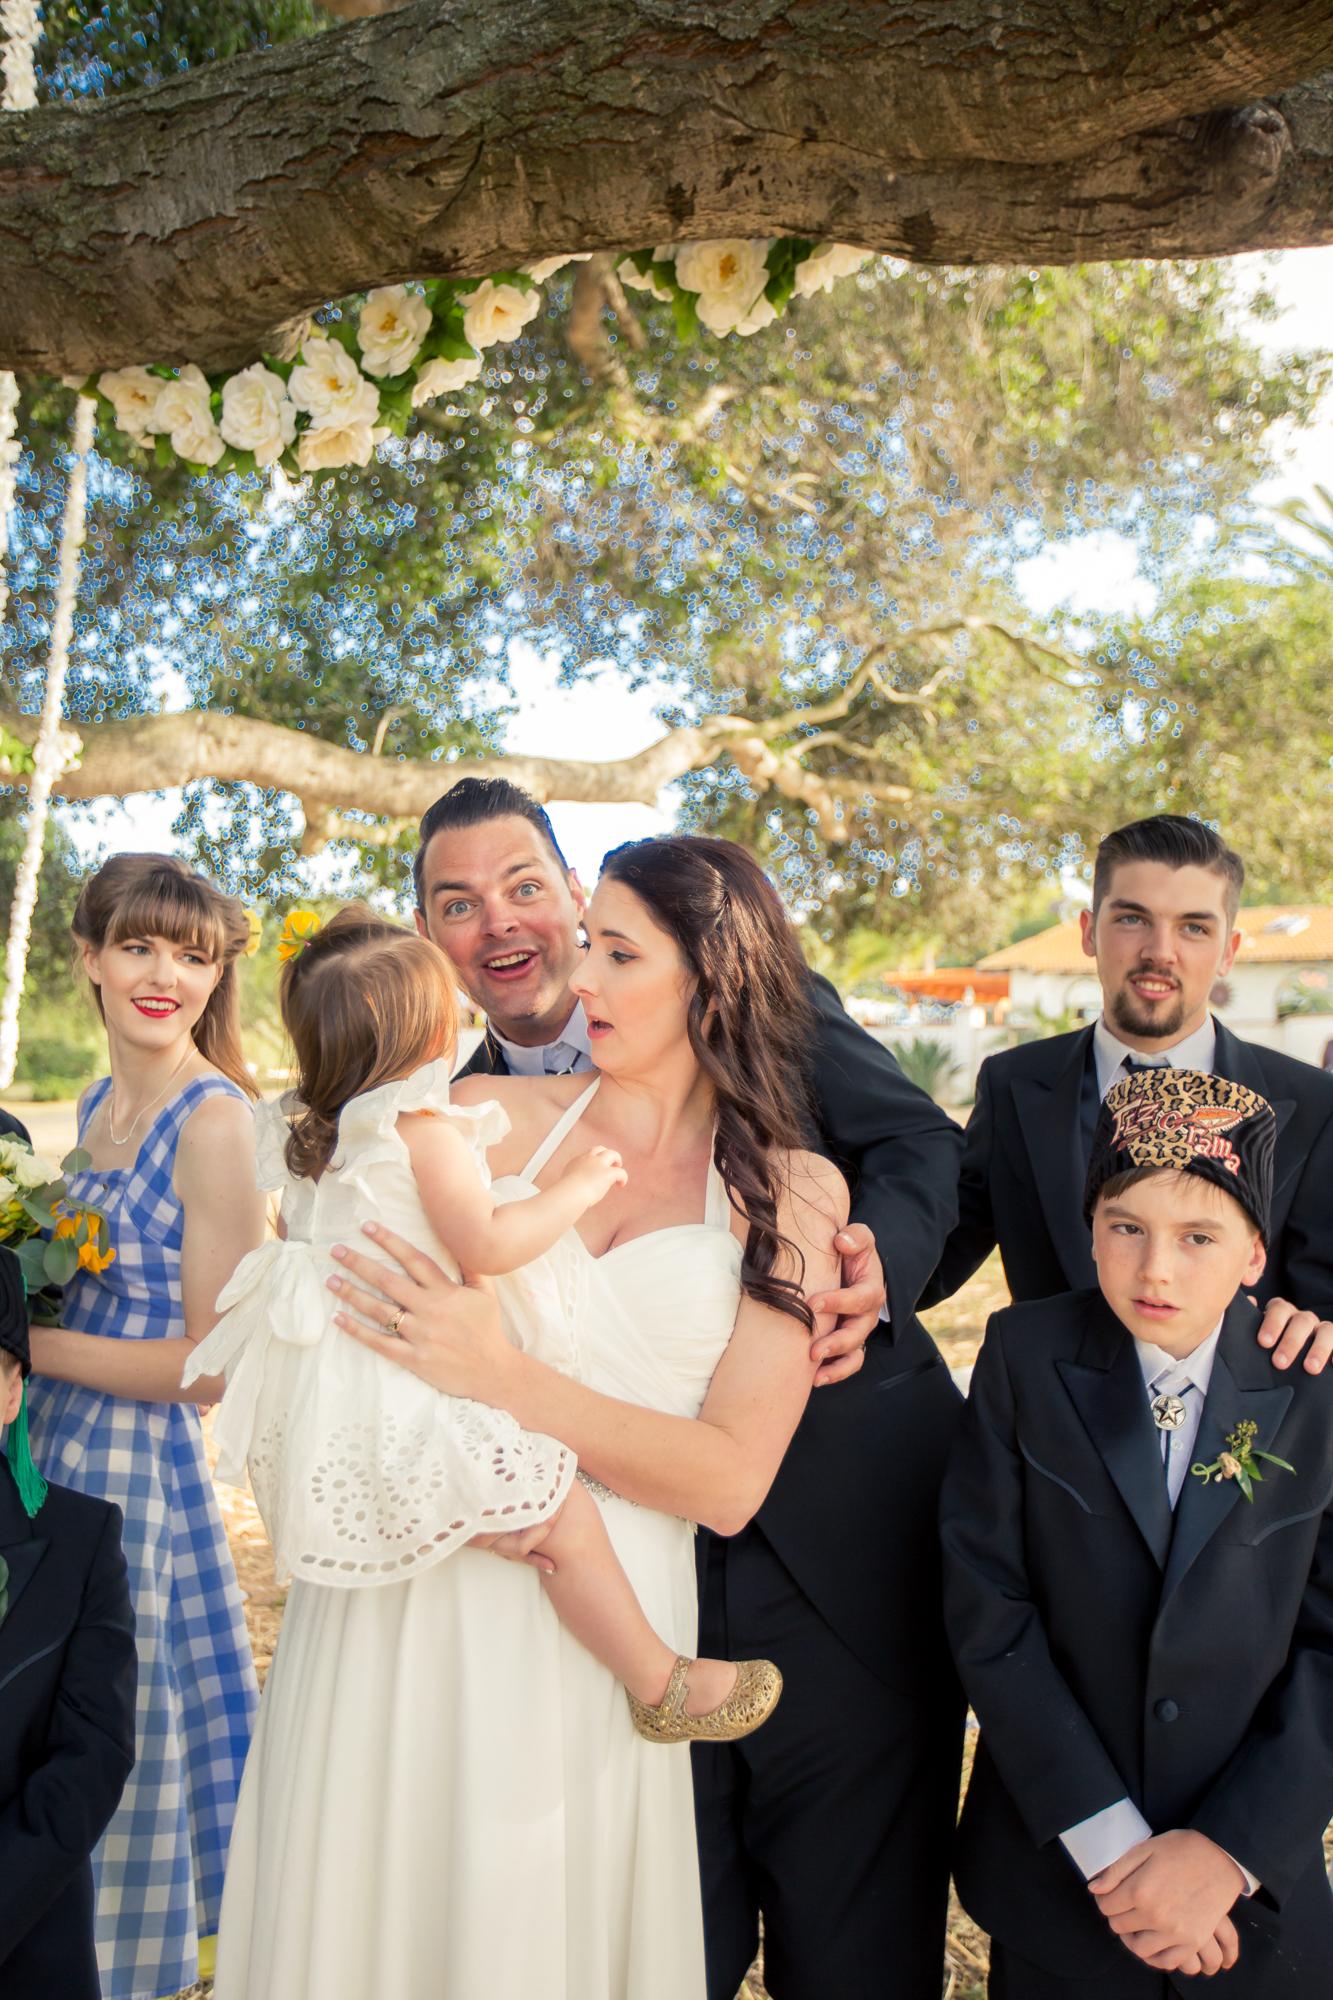 Gary-Kasl-SandKasl-Imaging-Wedding-Photography-46.jpg